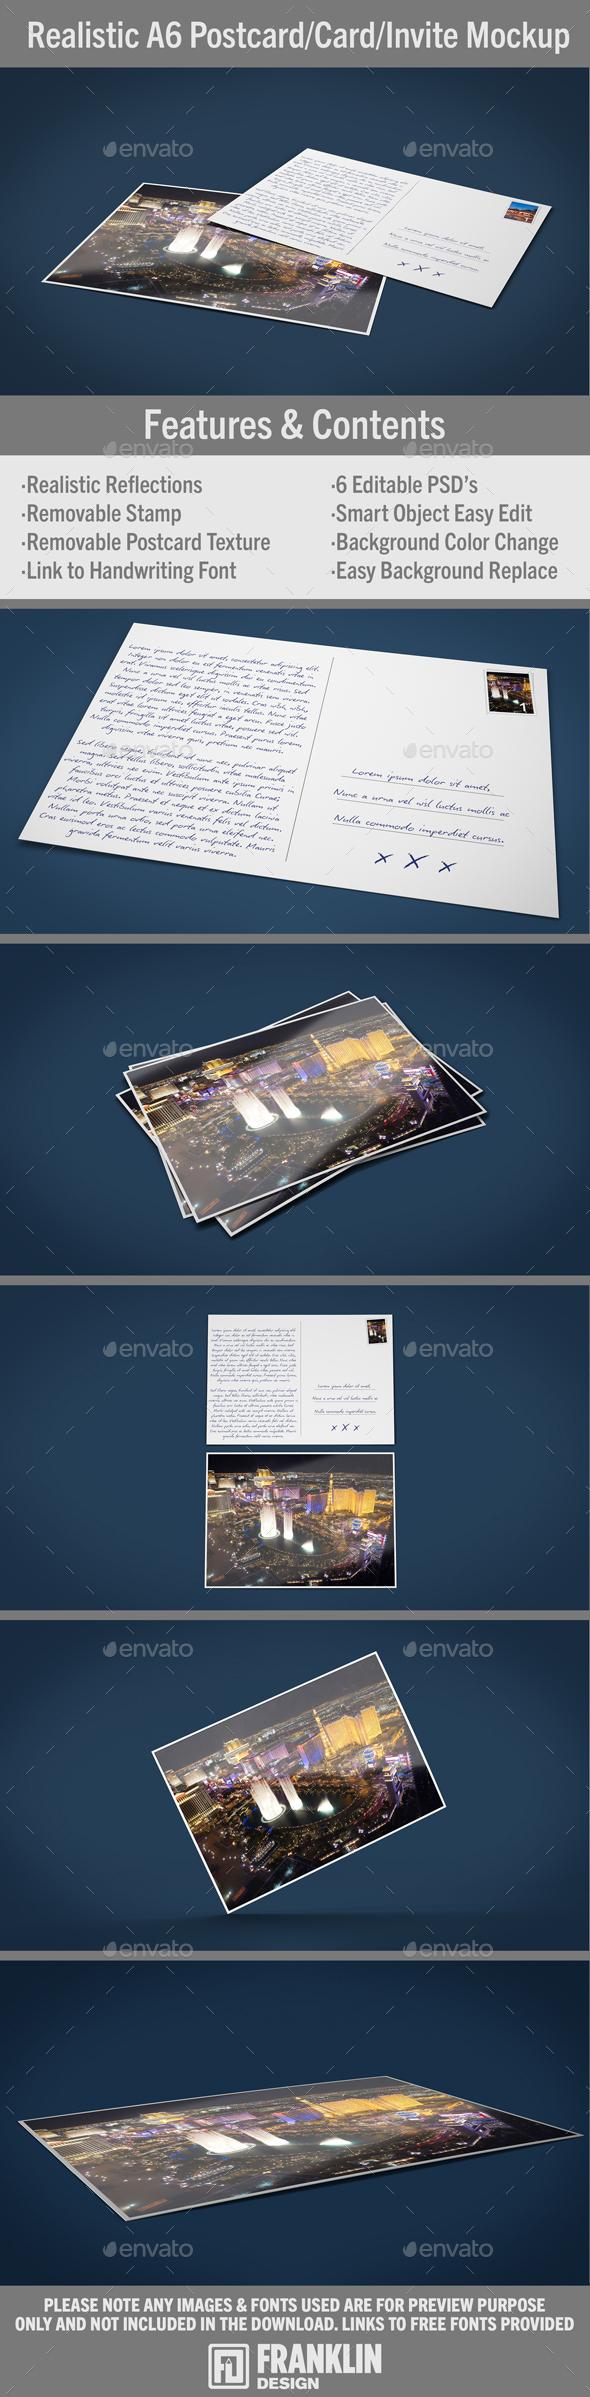 Realistic A6 Postcard/Card Mockup - Flyers Print